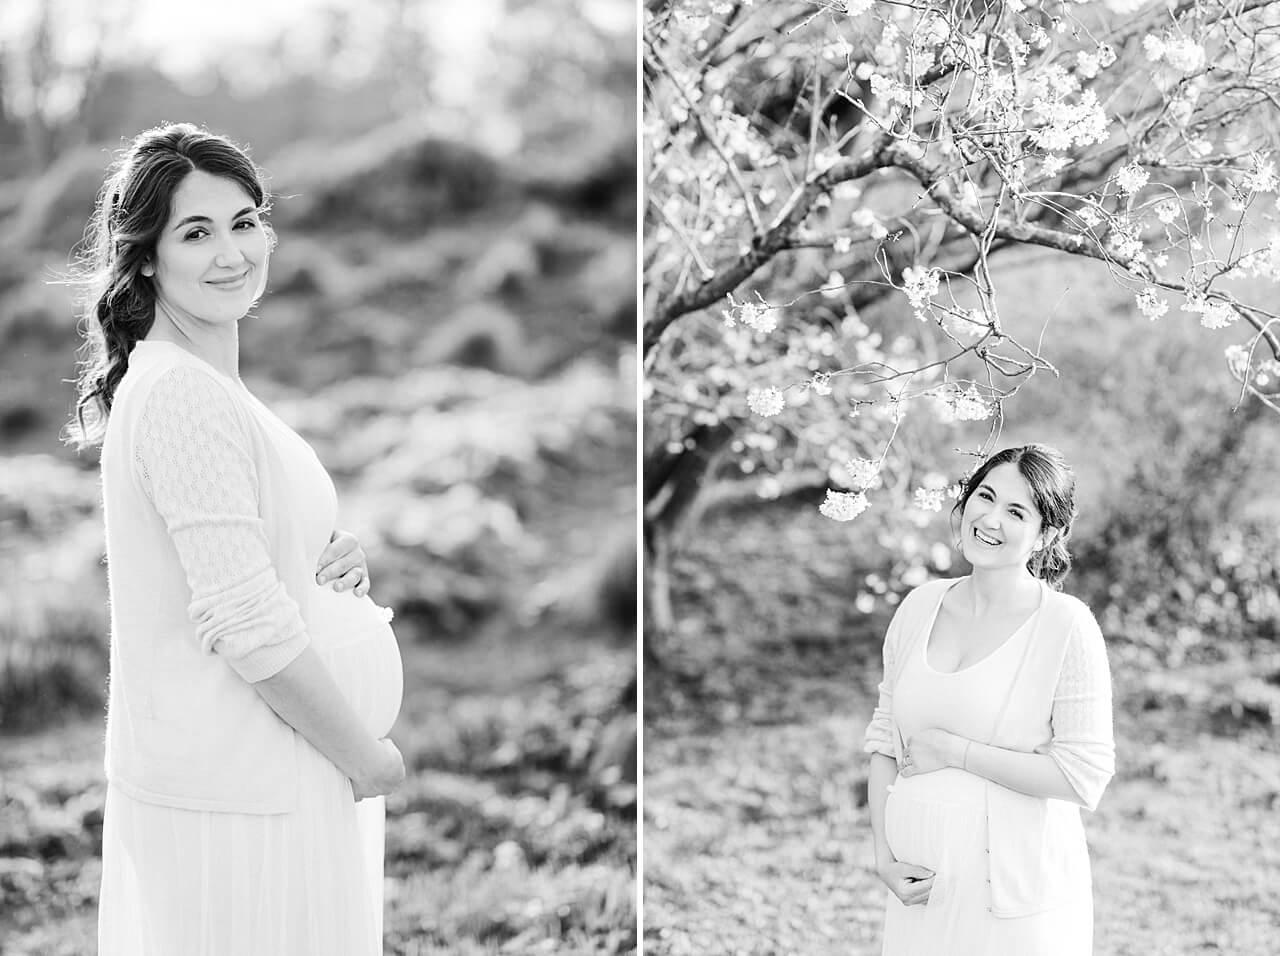 Rebecca Conte Fotografie: Familienshooting Geheimnis 18